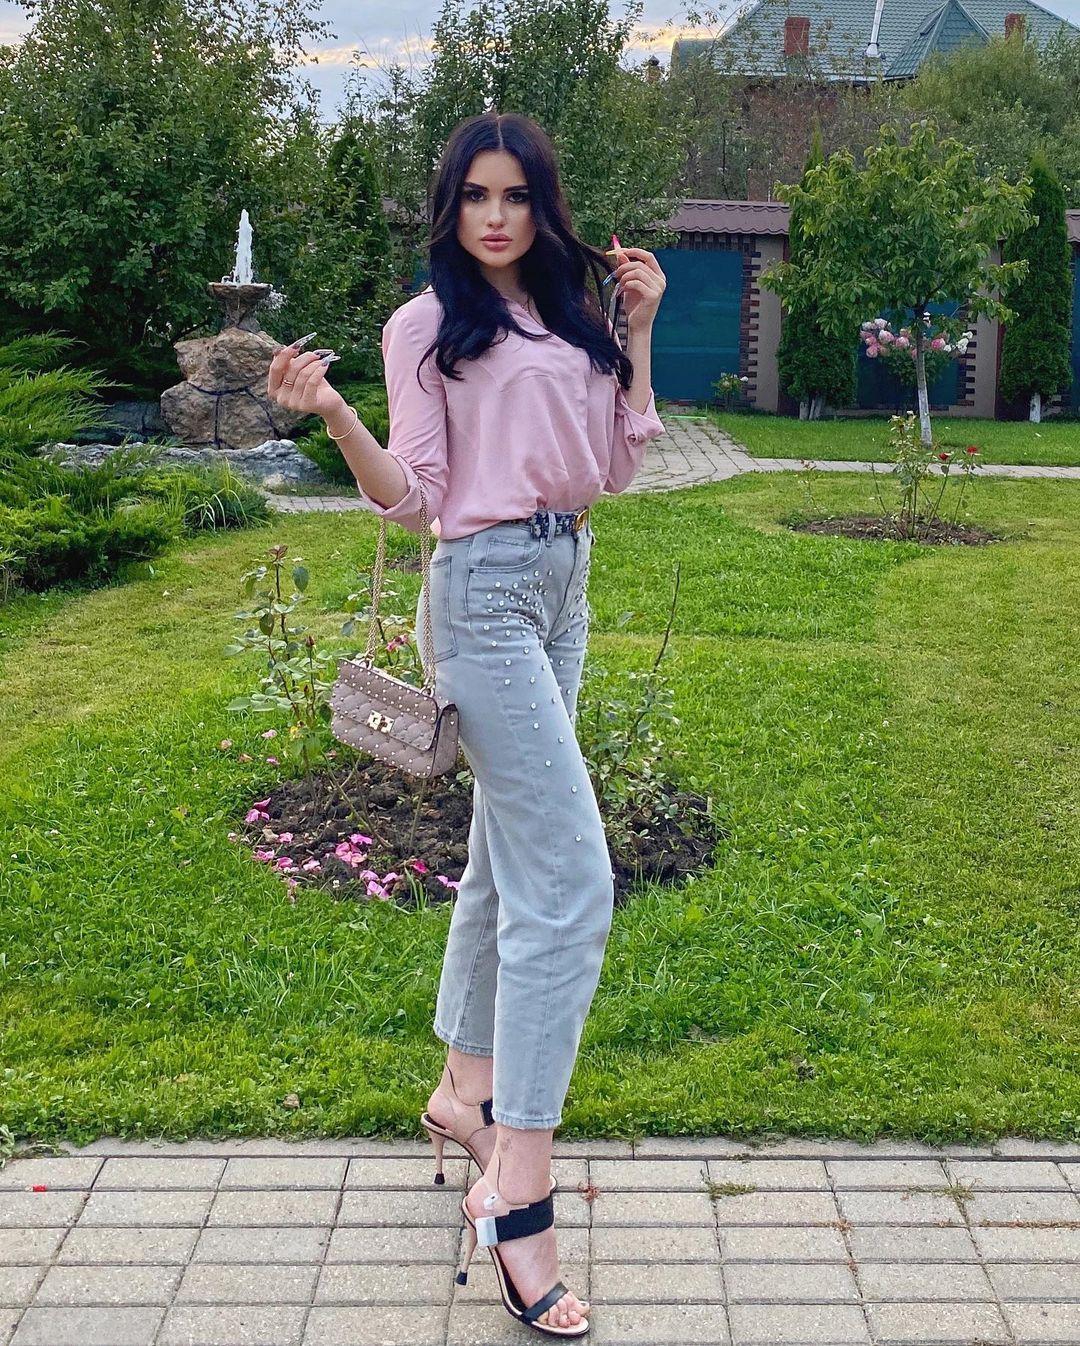 Karina-Arakelyan-Wallpapers-Insta-Fit-Bio-10